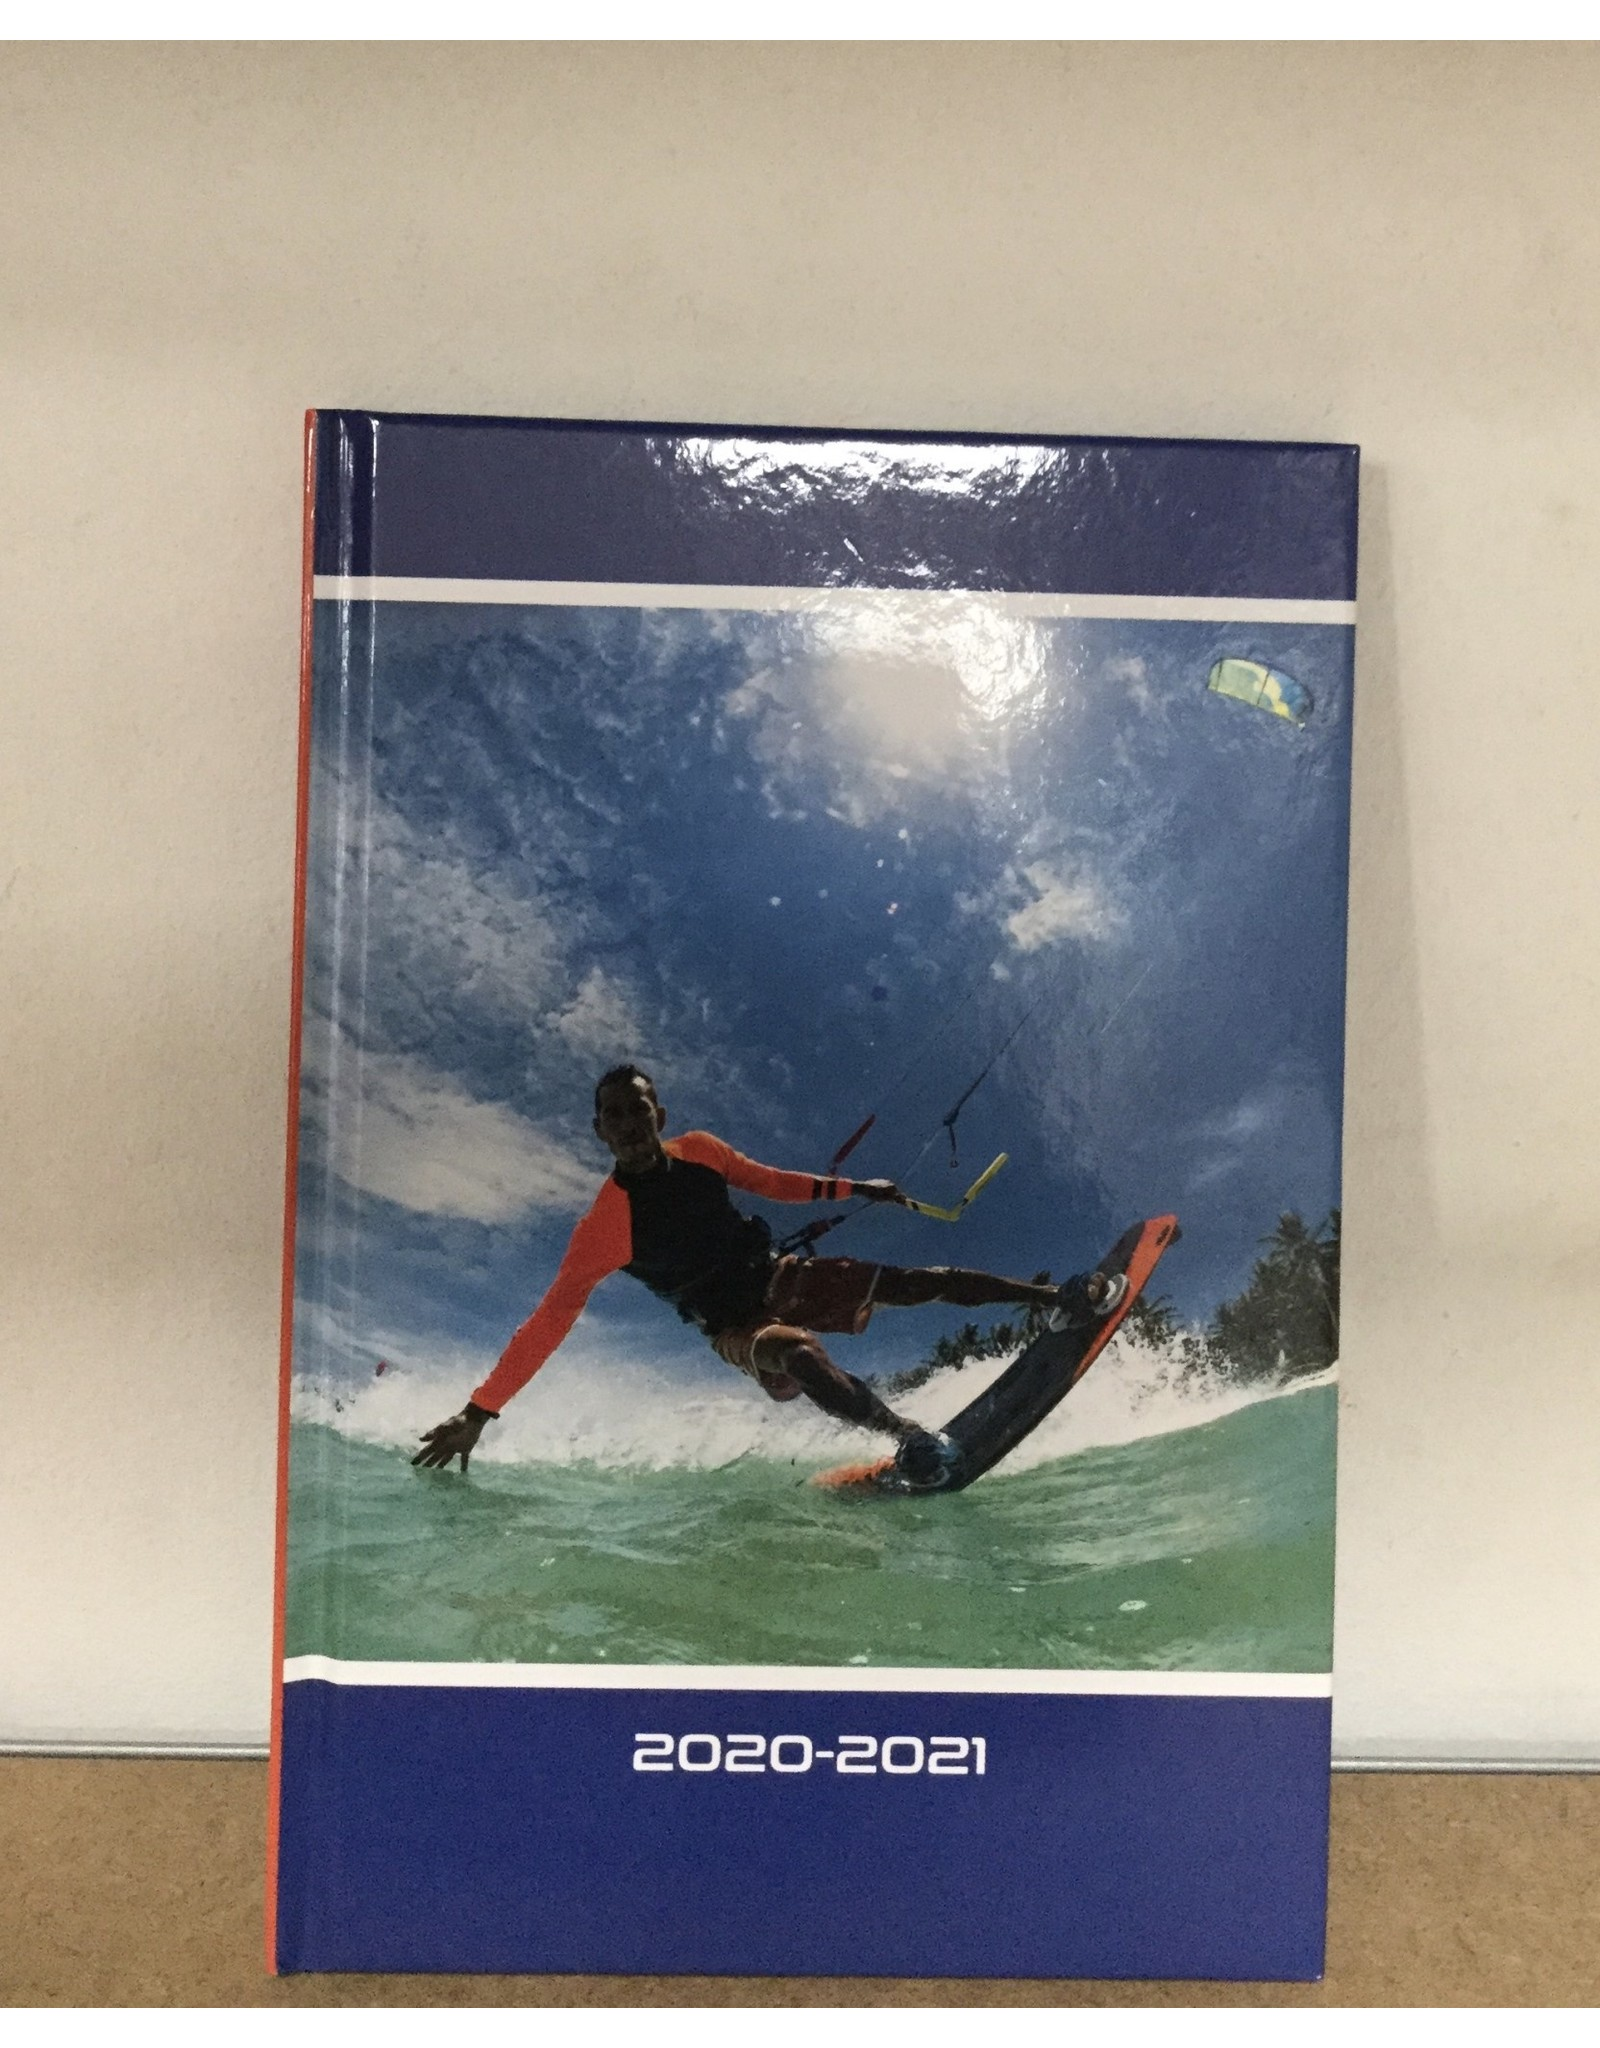 AGENDA HK SURFERS A5 20-21